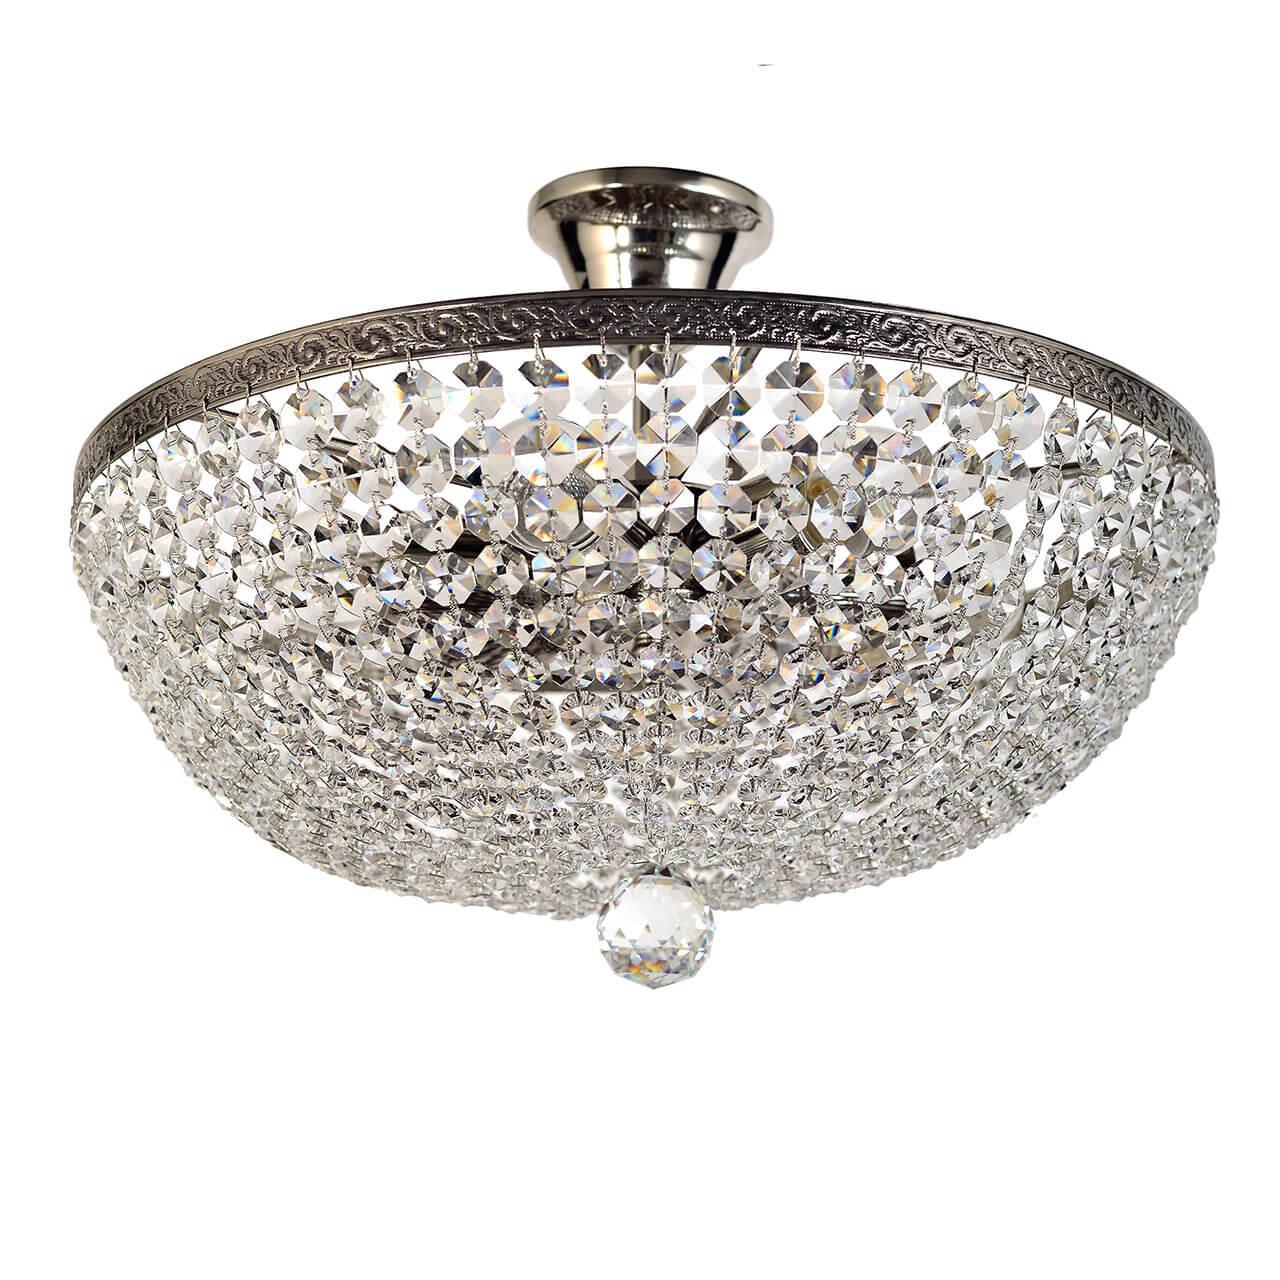 Потолочный светильник Arti Lampadari Nobile E 1.3.40.601 NH